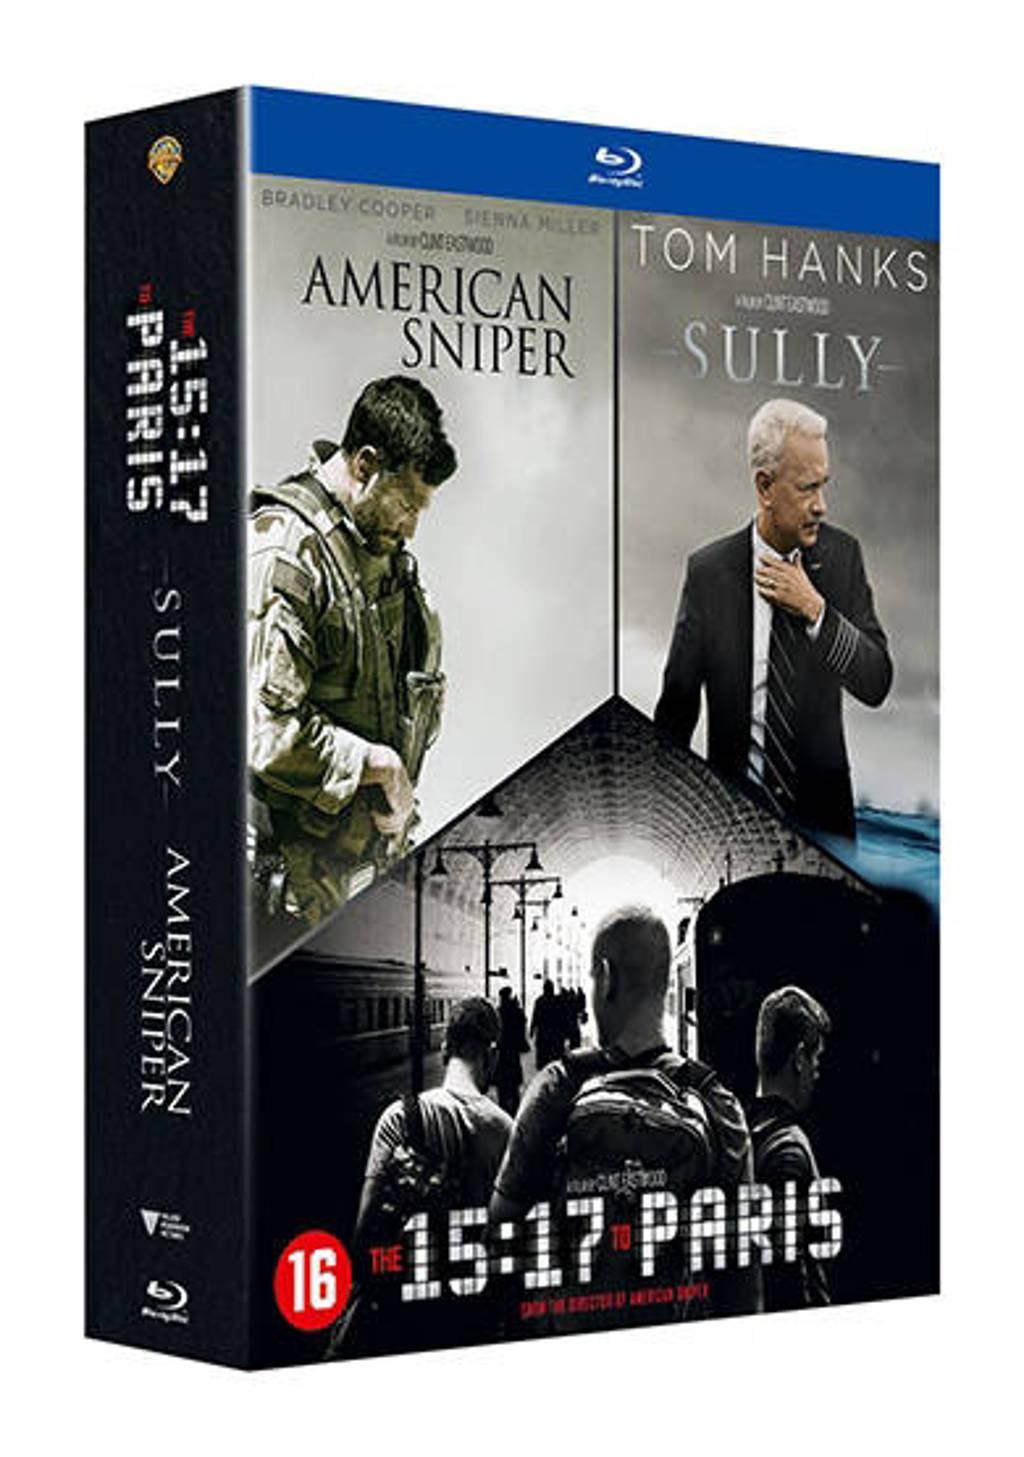 Clint Eastwood - Heroes box (Blu-ray)